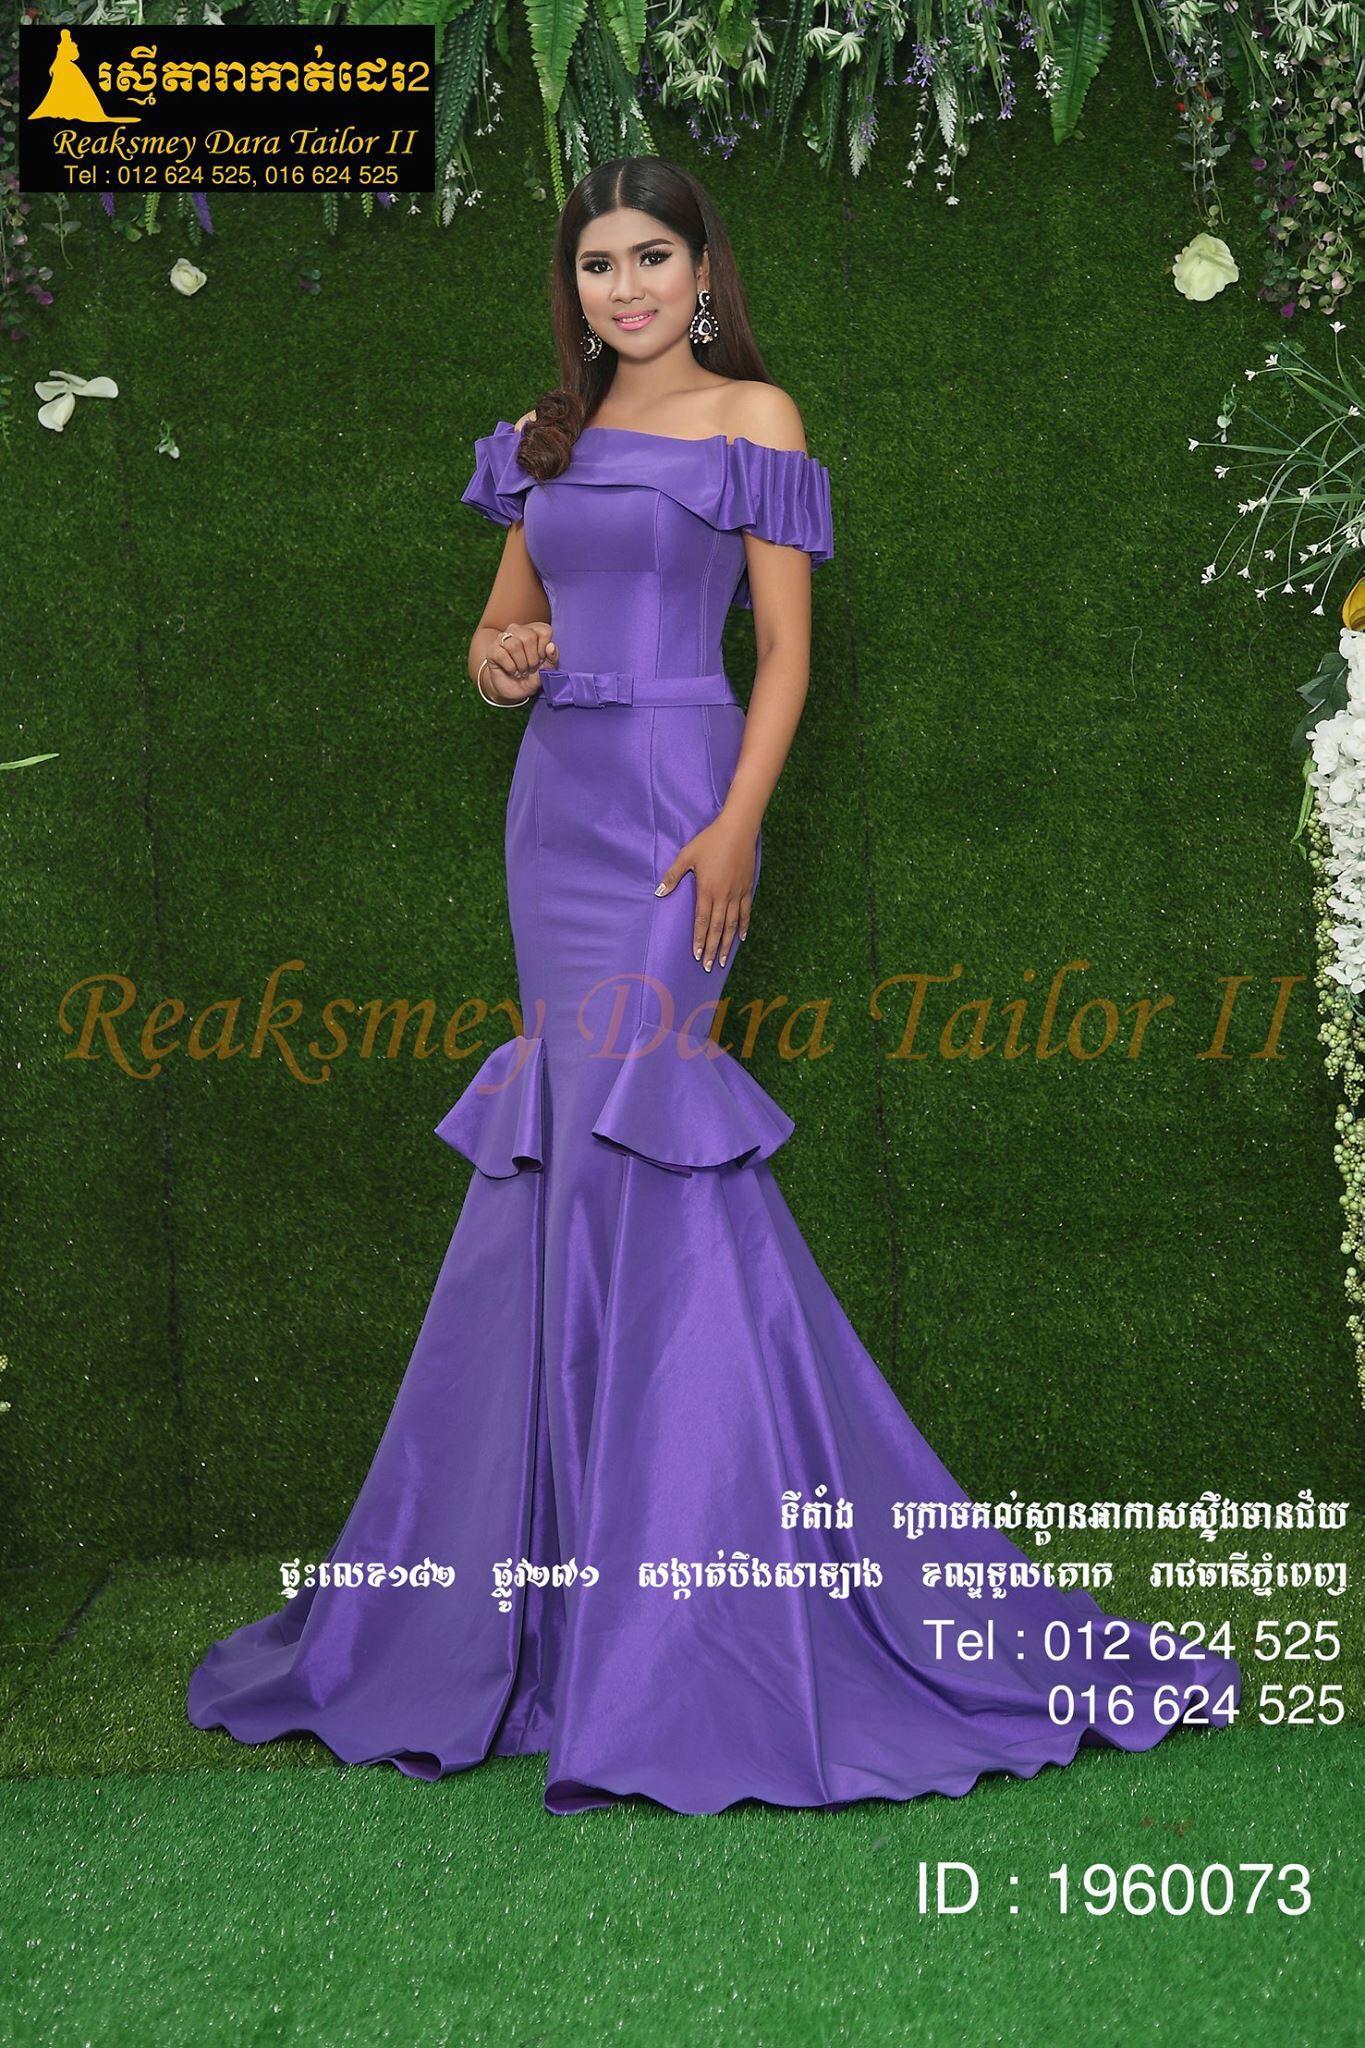 Cambodia fashion | แบบชุดใหม่24ส.ค.70 | Pinterest